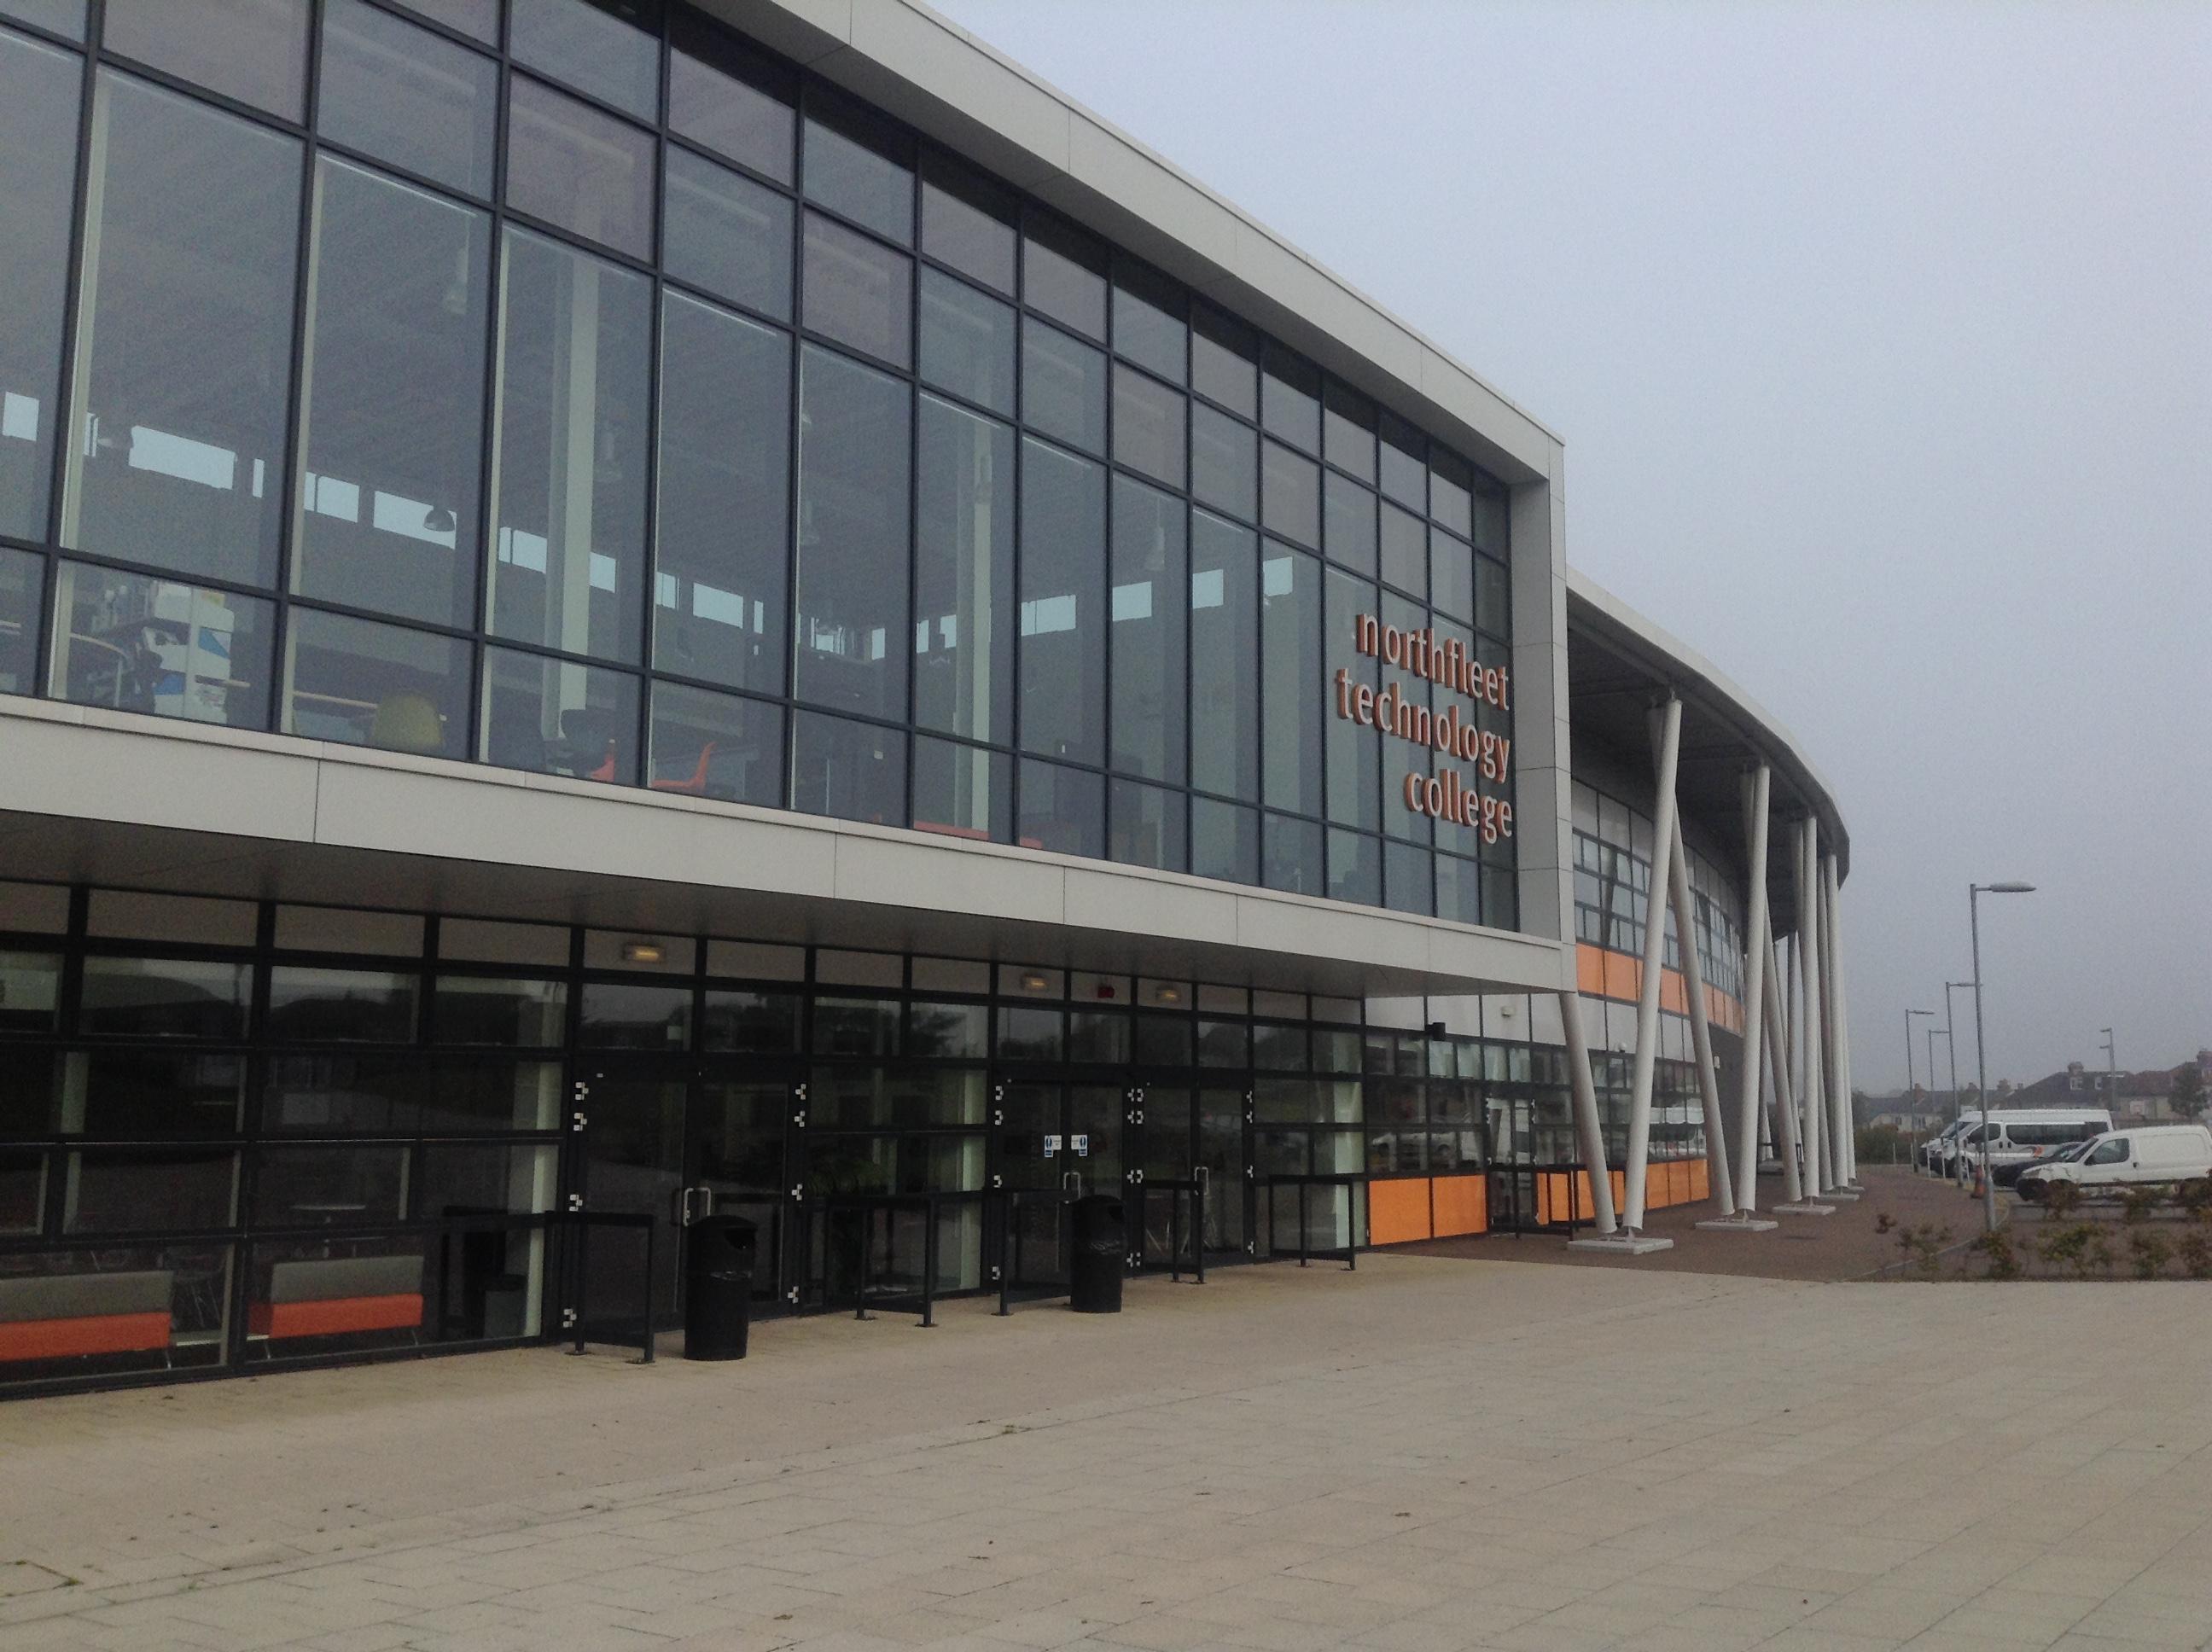 Northfleet Technology College